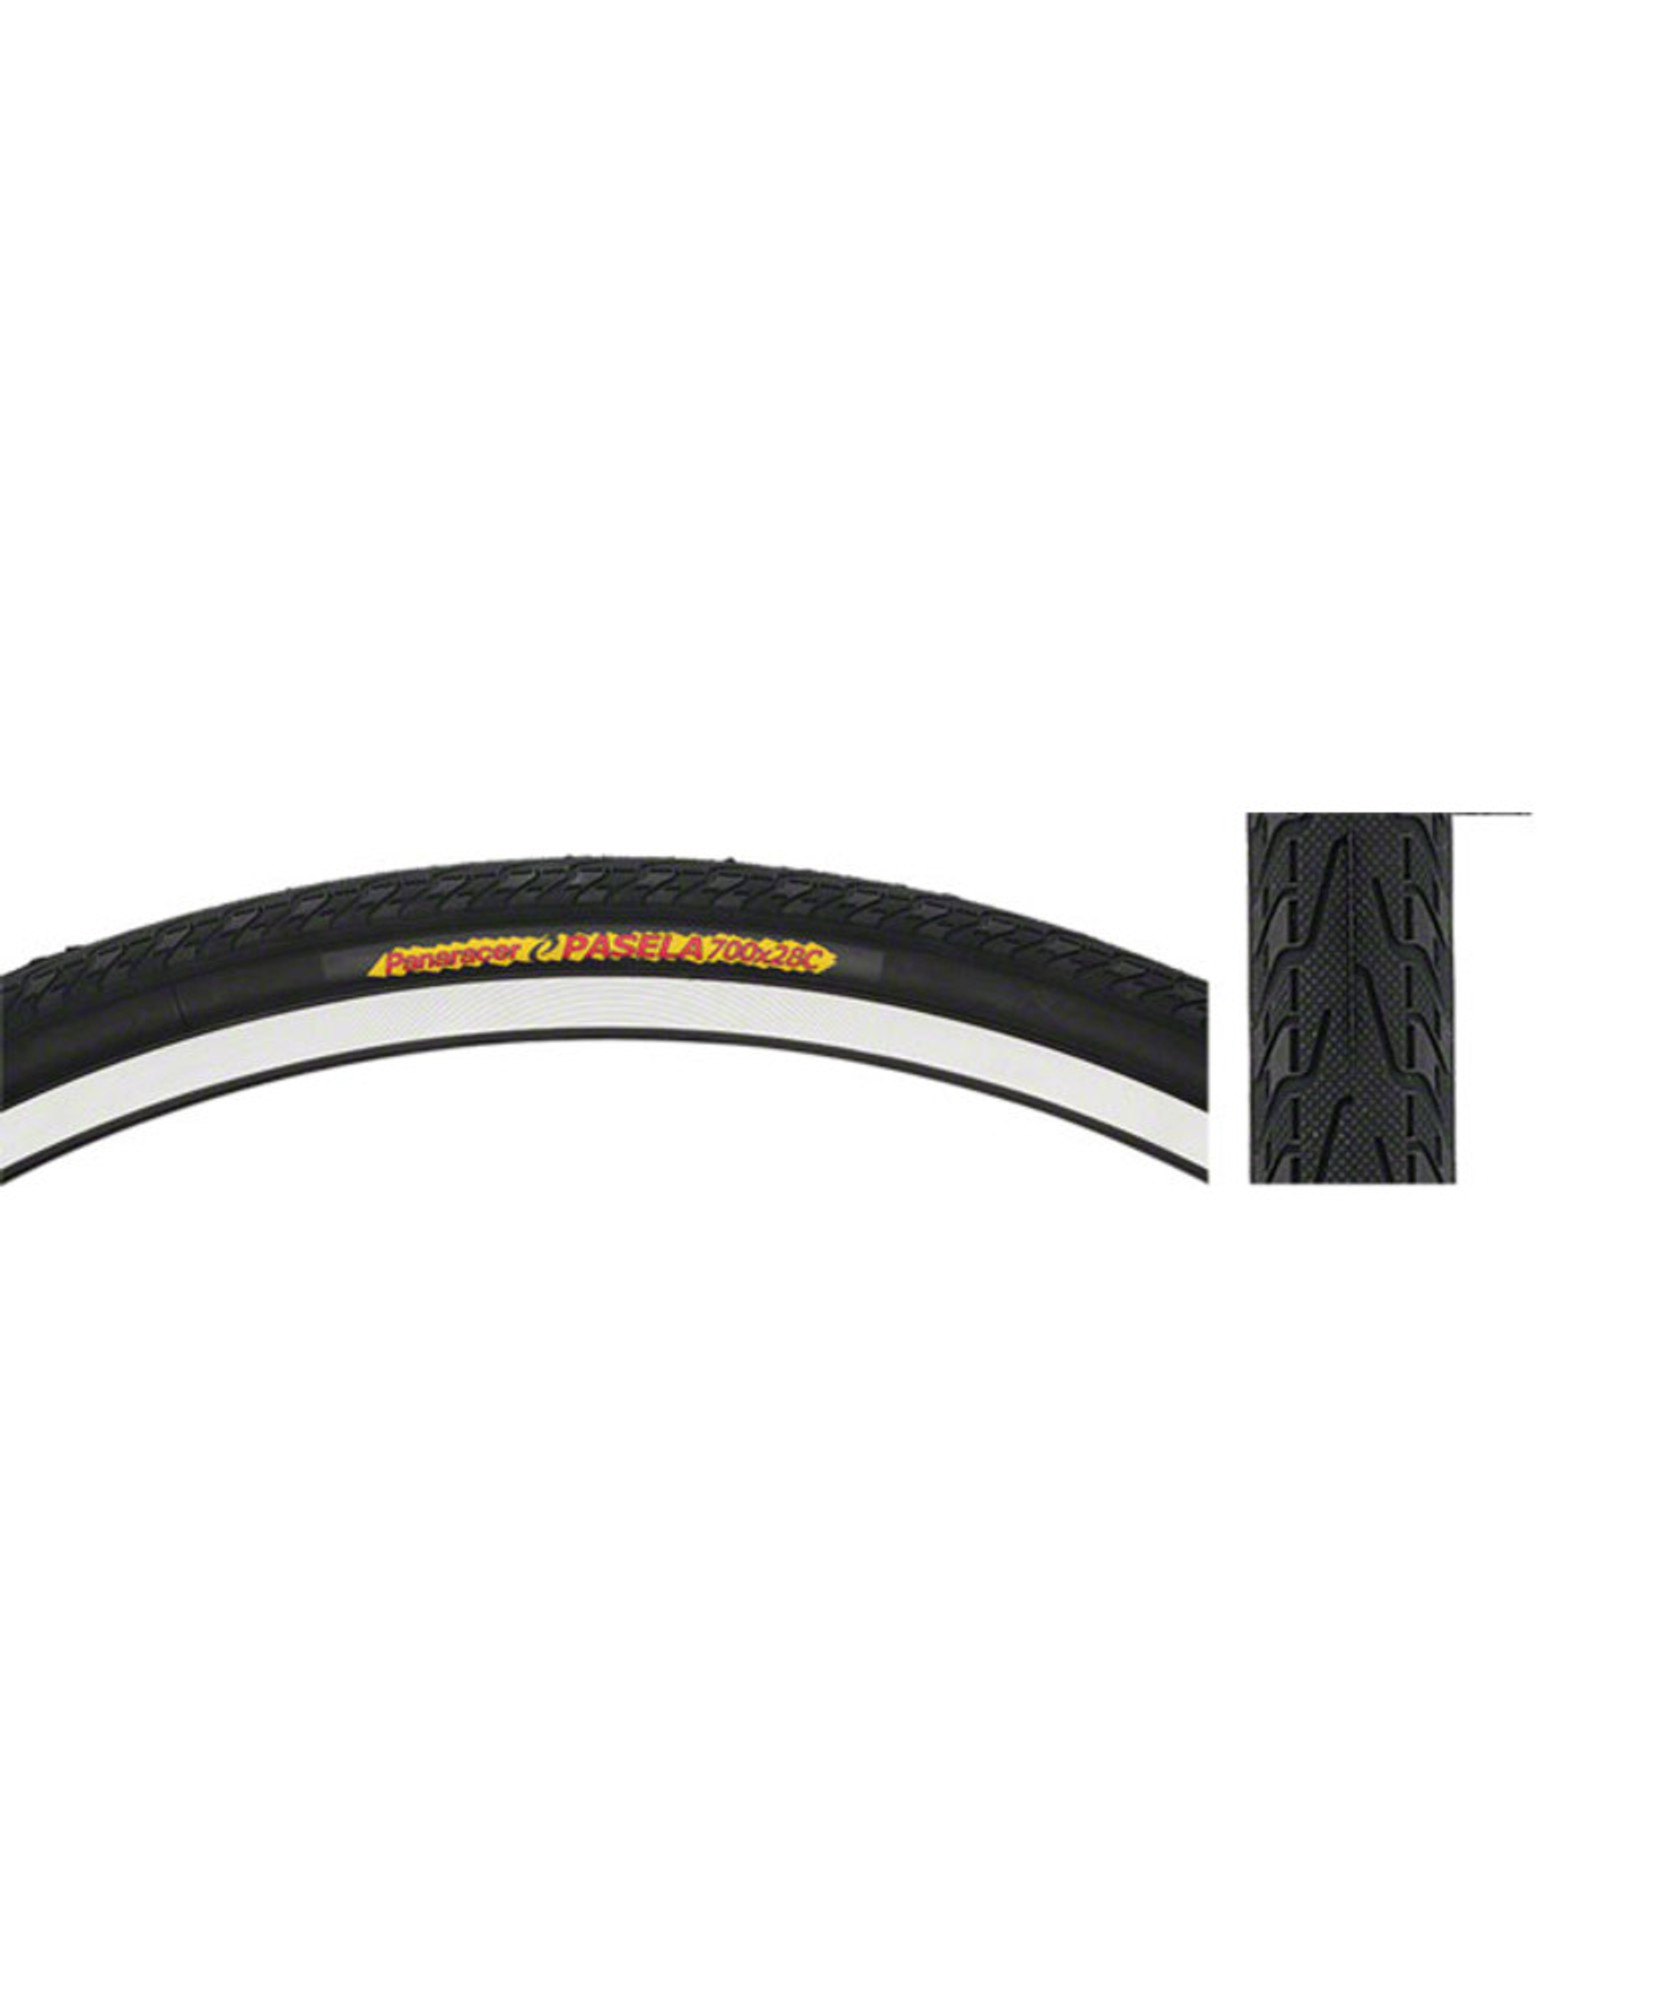 New Panaracer Pasela 700x28c Black Steel